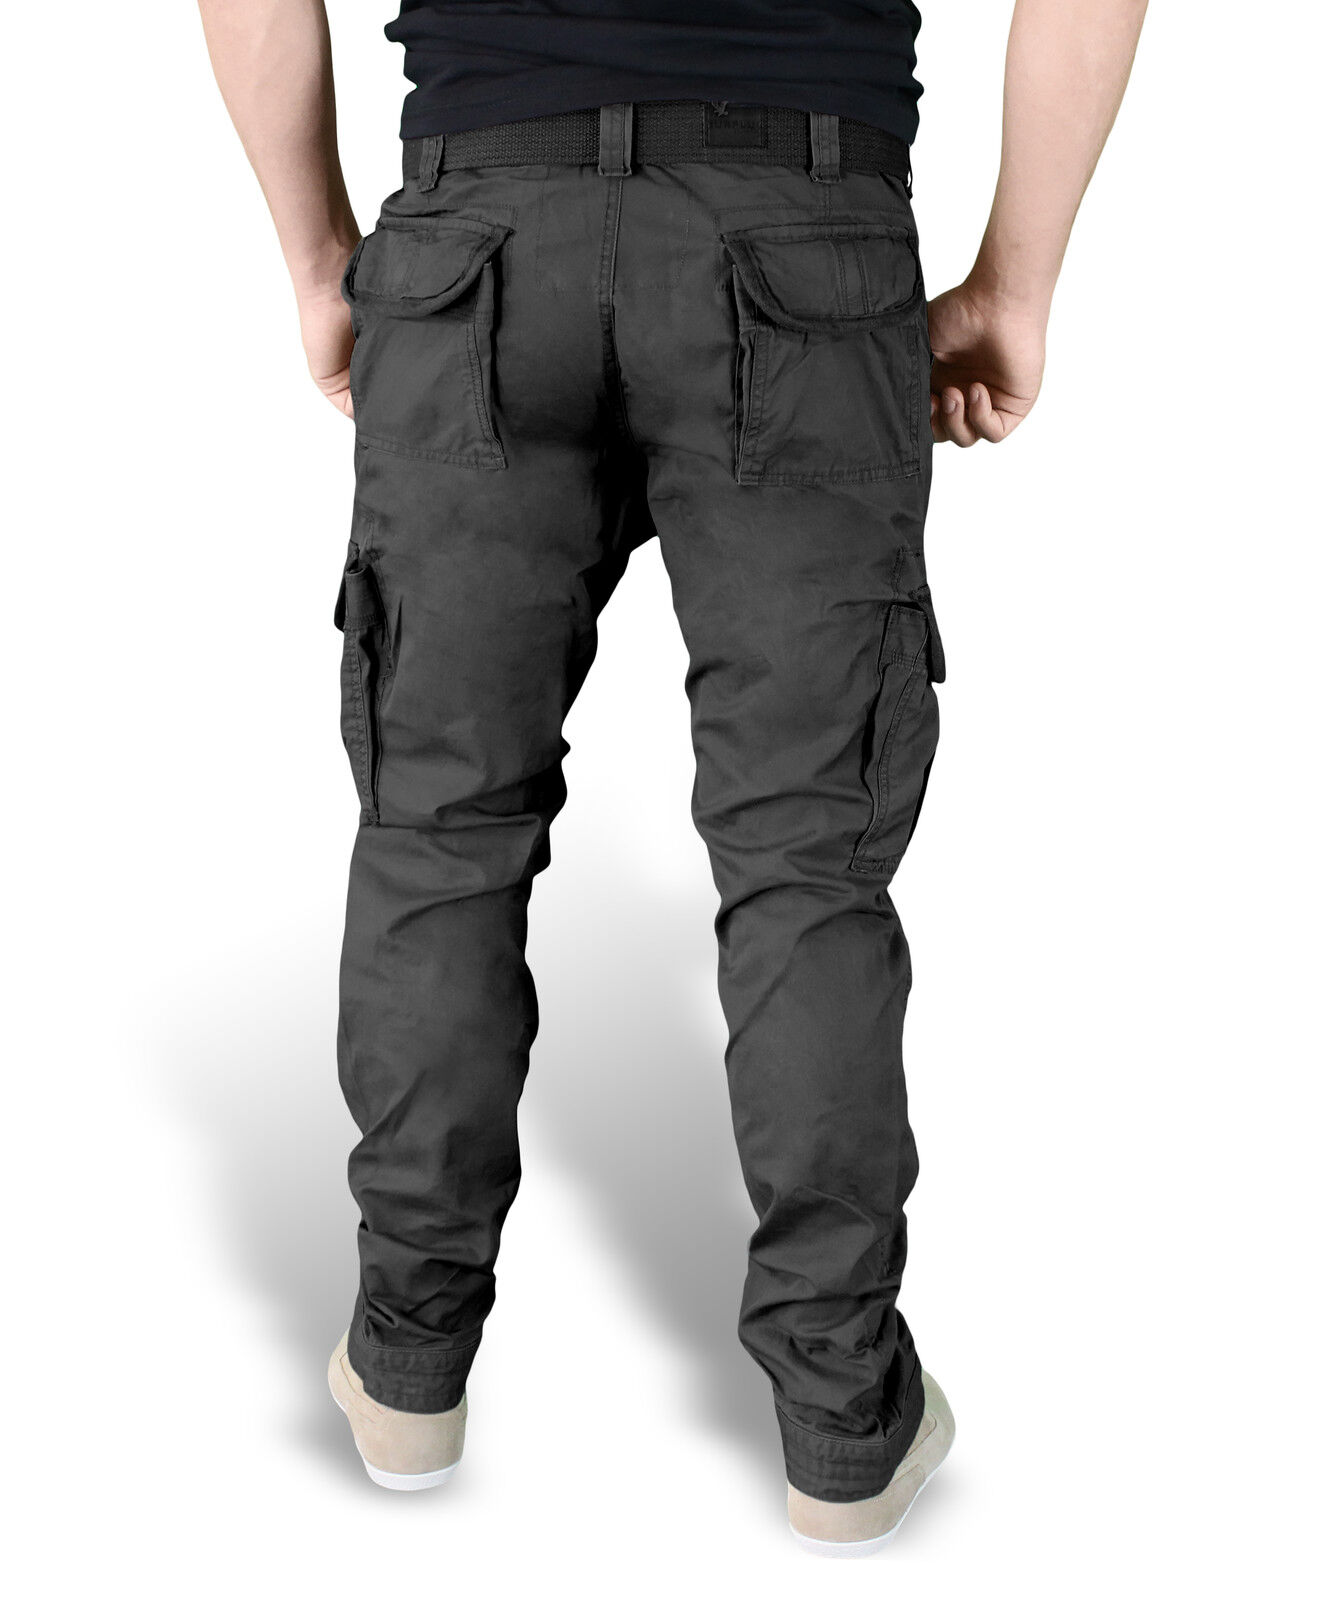 Surplus Herren Premium Slimmy Cargo Hose Trousers Trousers Trousers mit Gürtel camo Army BW 3602 dcc66b